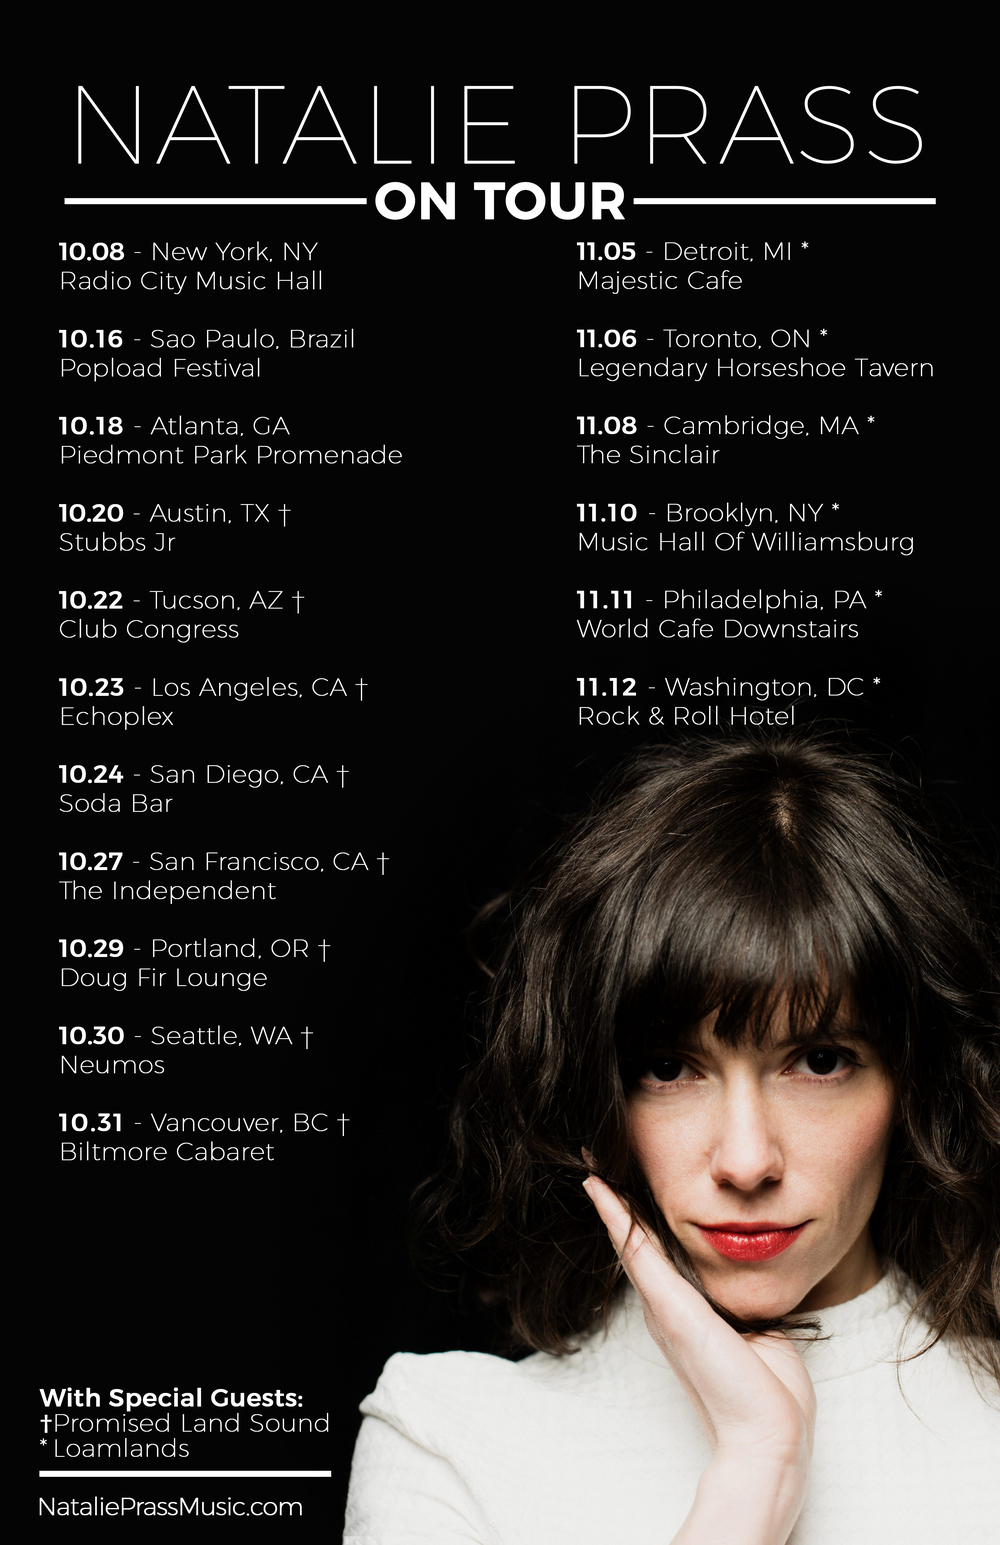 Natalie Prass Tour Poster